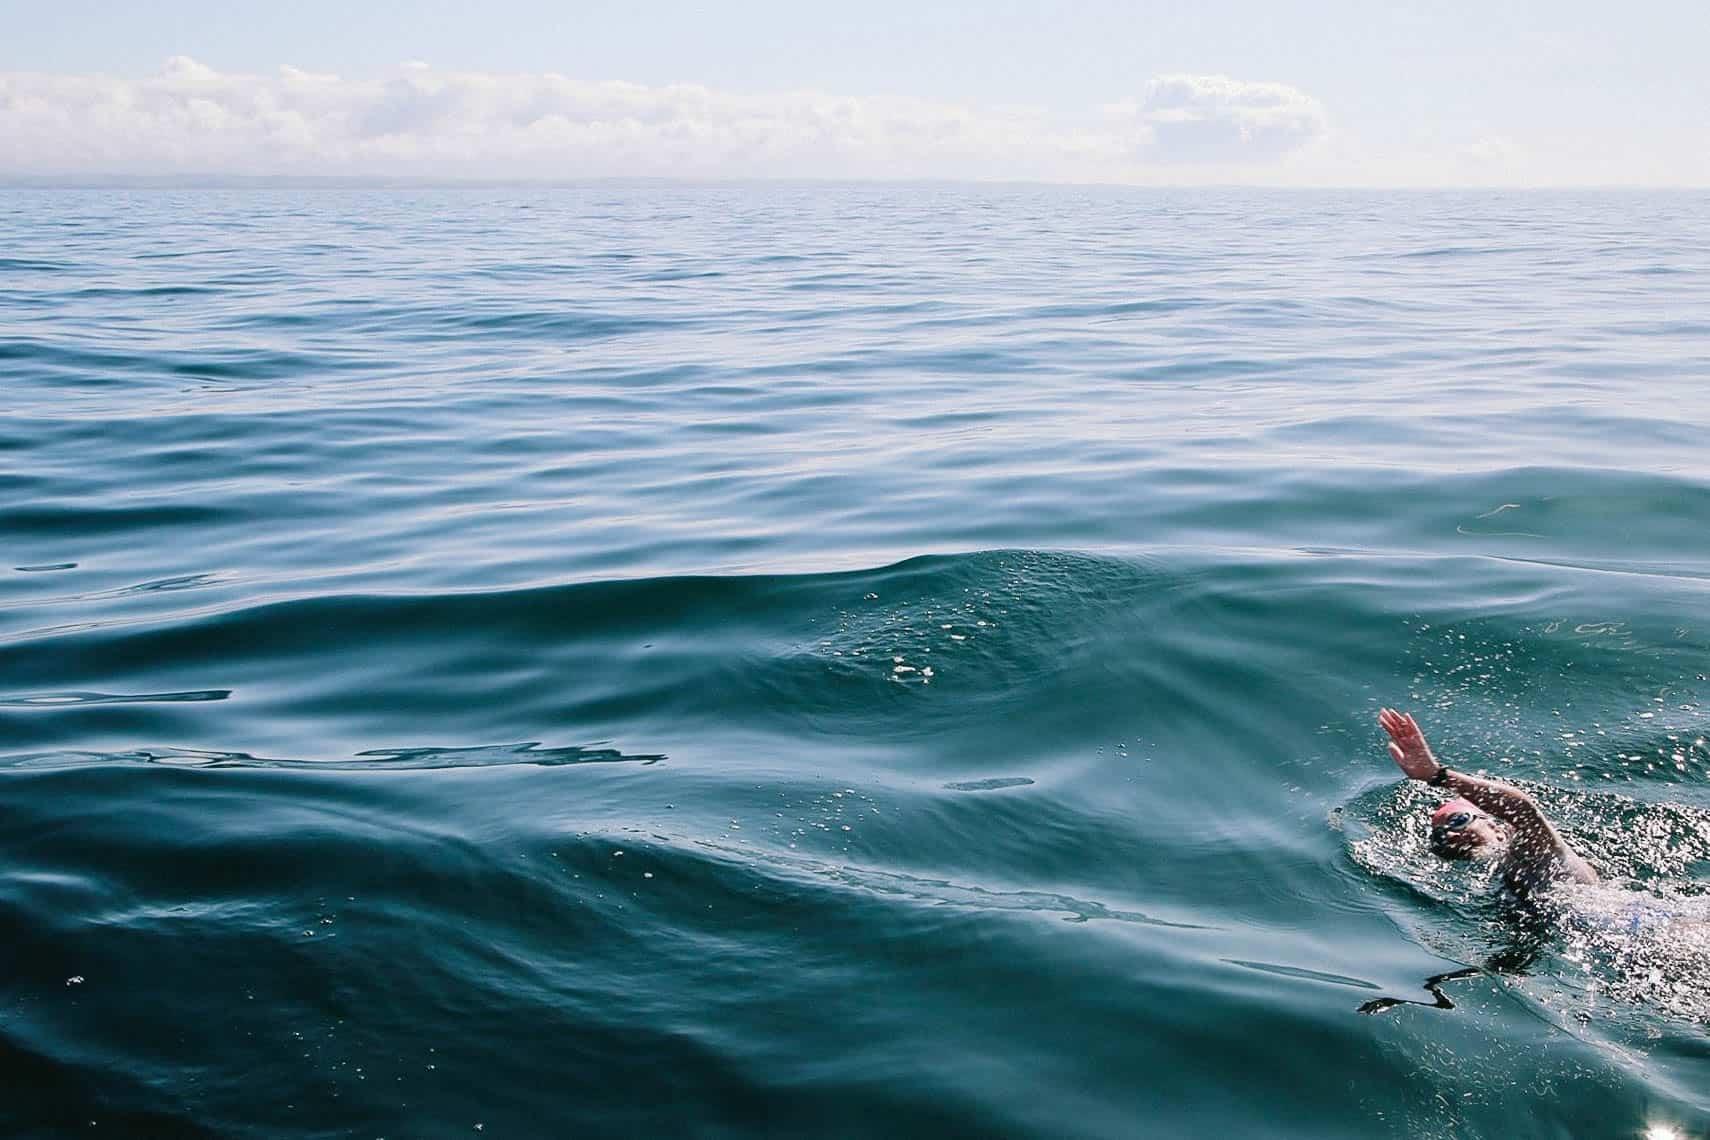 Sam Swimming North Channel Ireland to Scotland 2019